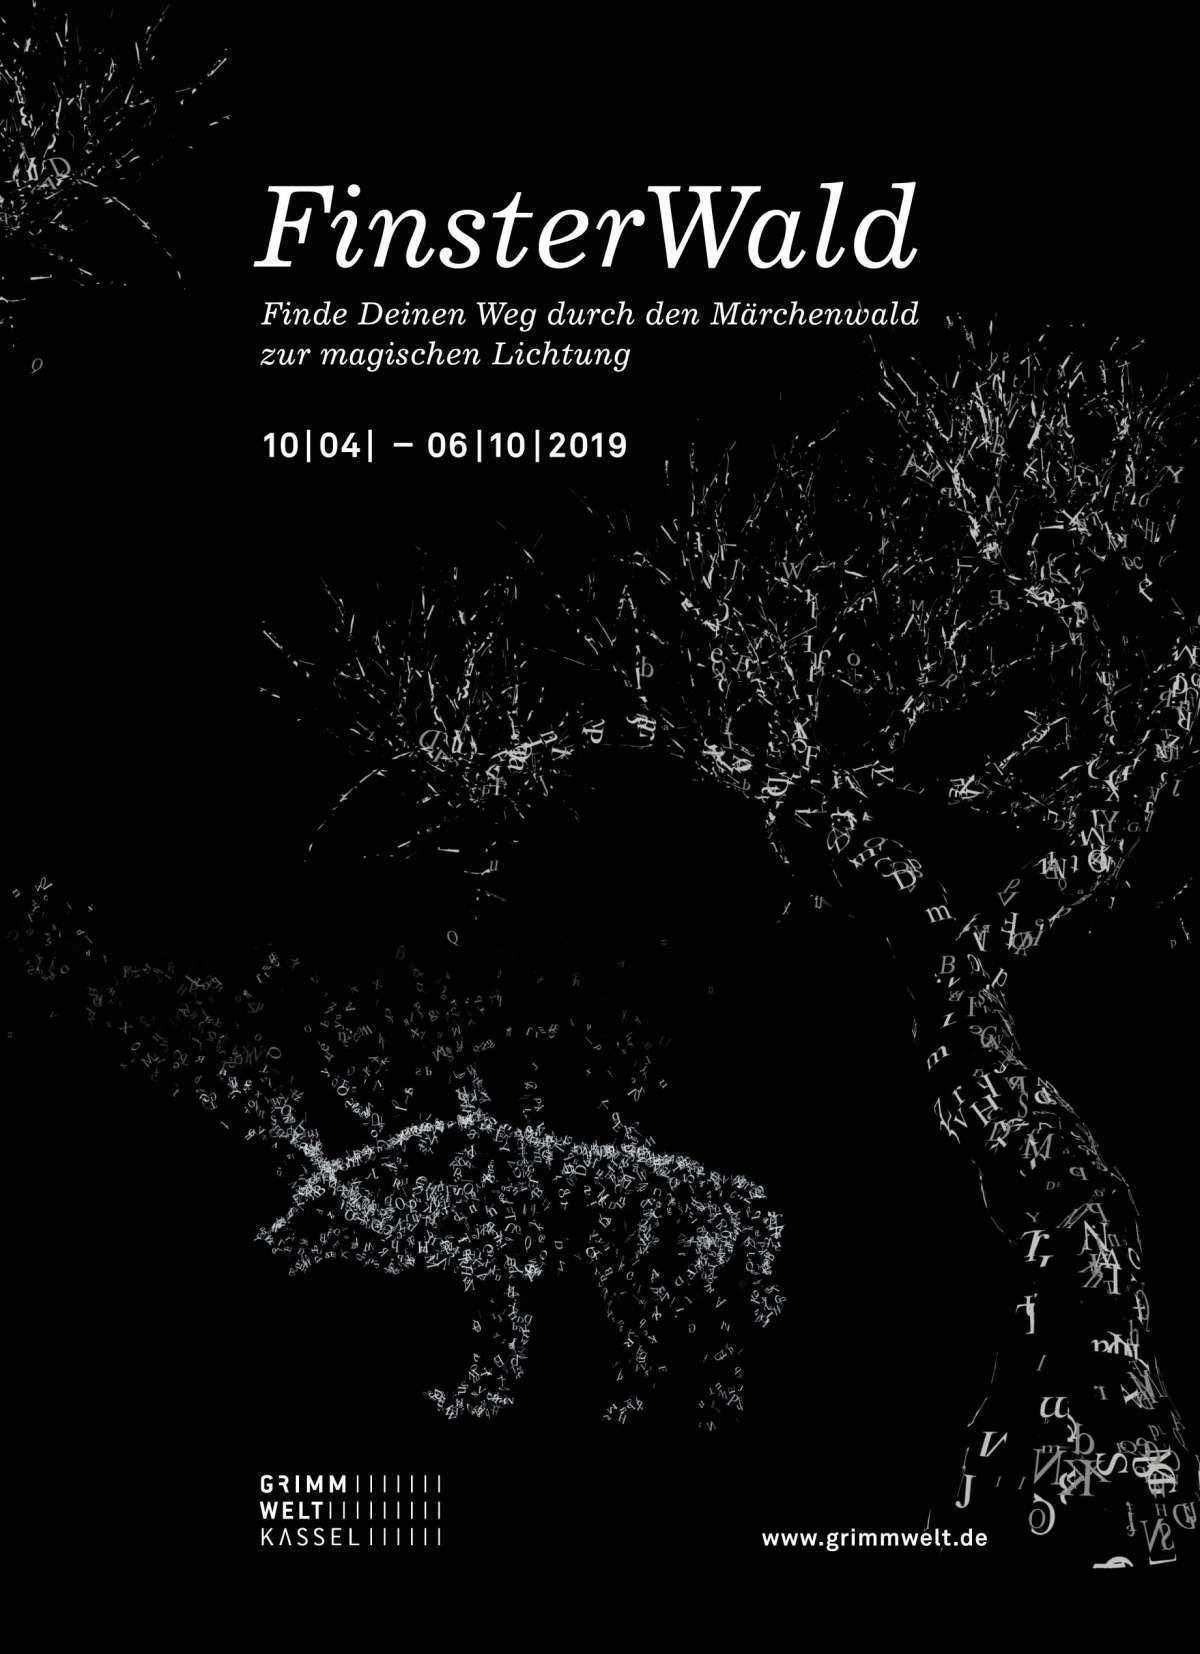 Veranstaltungen & Events am »Samstag, 21. September 2019« in deiner Nähe...